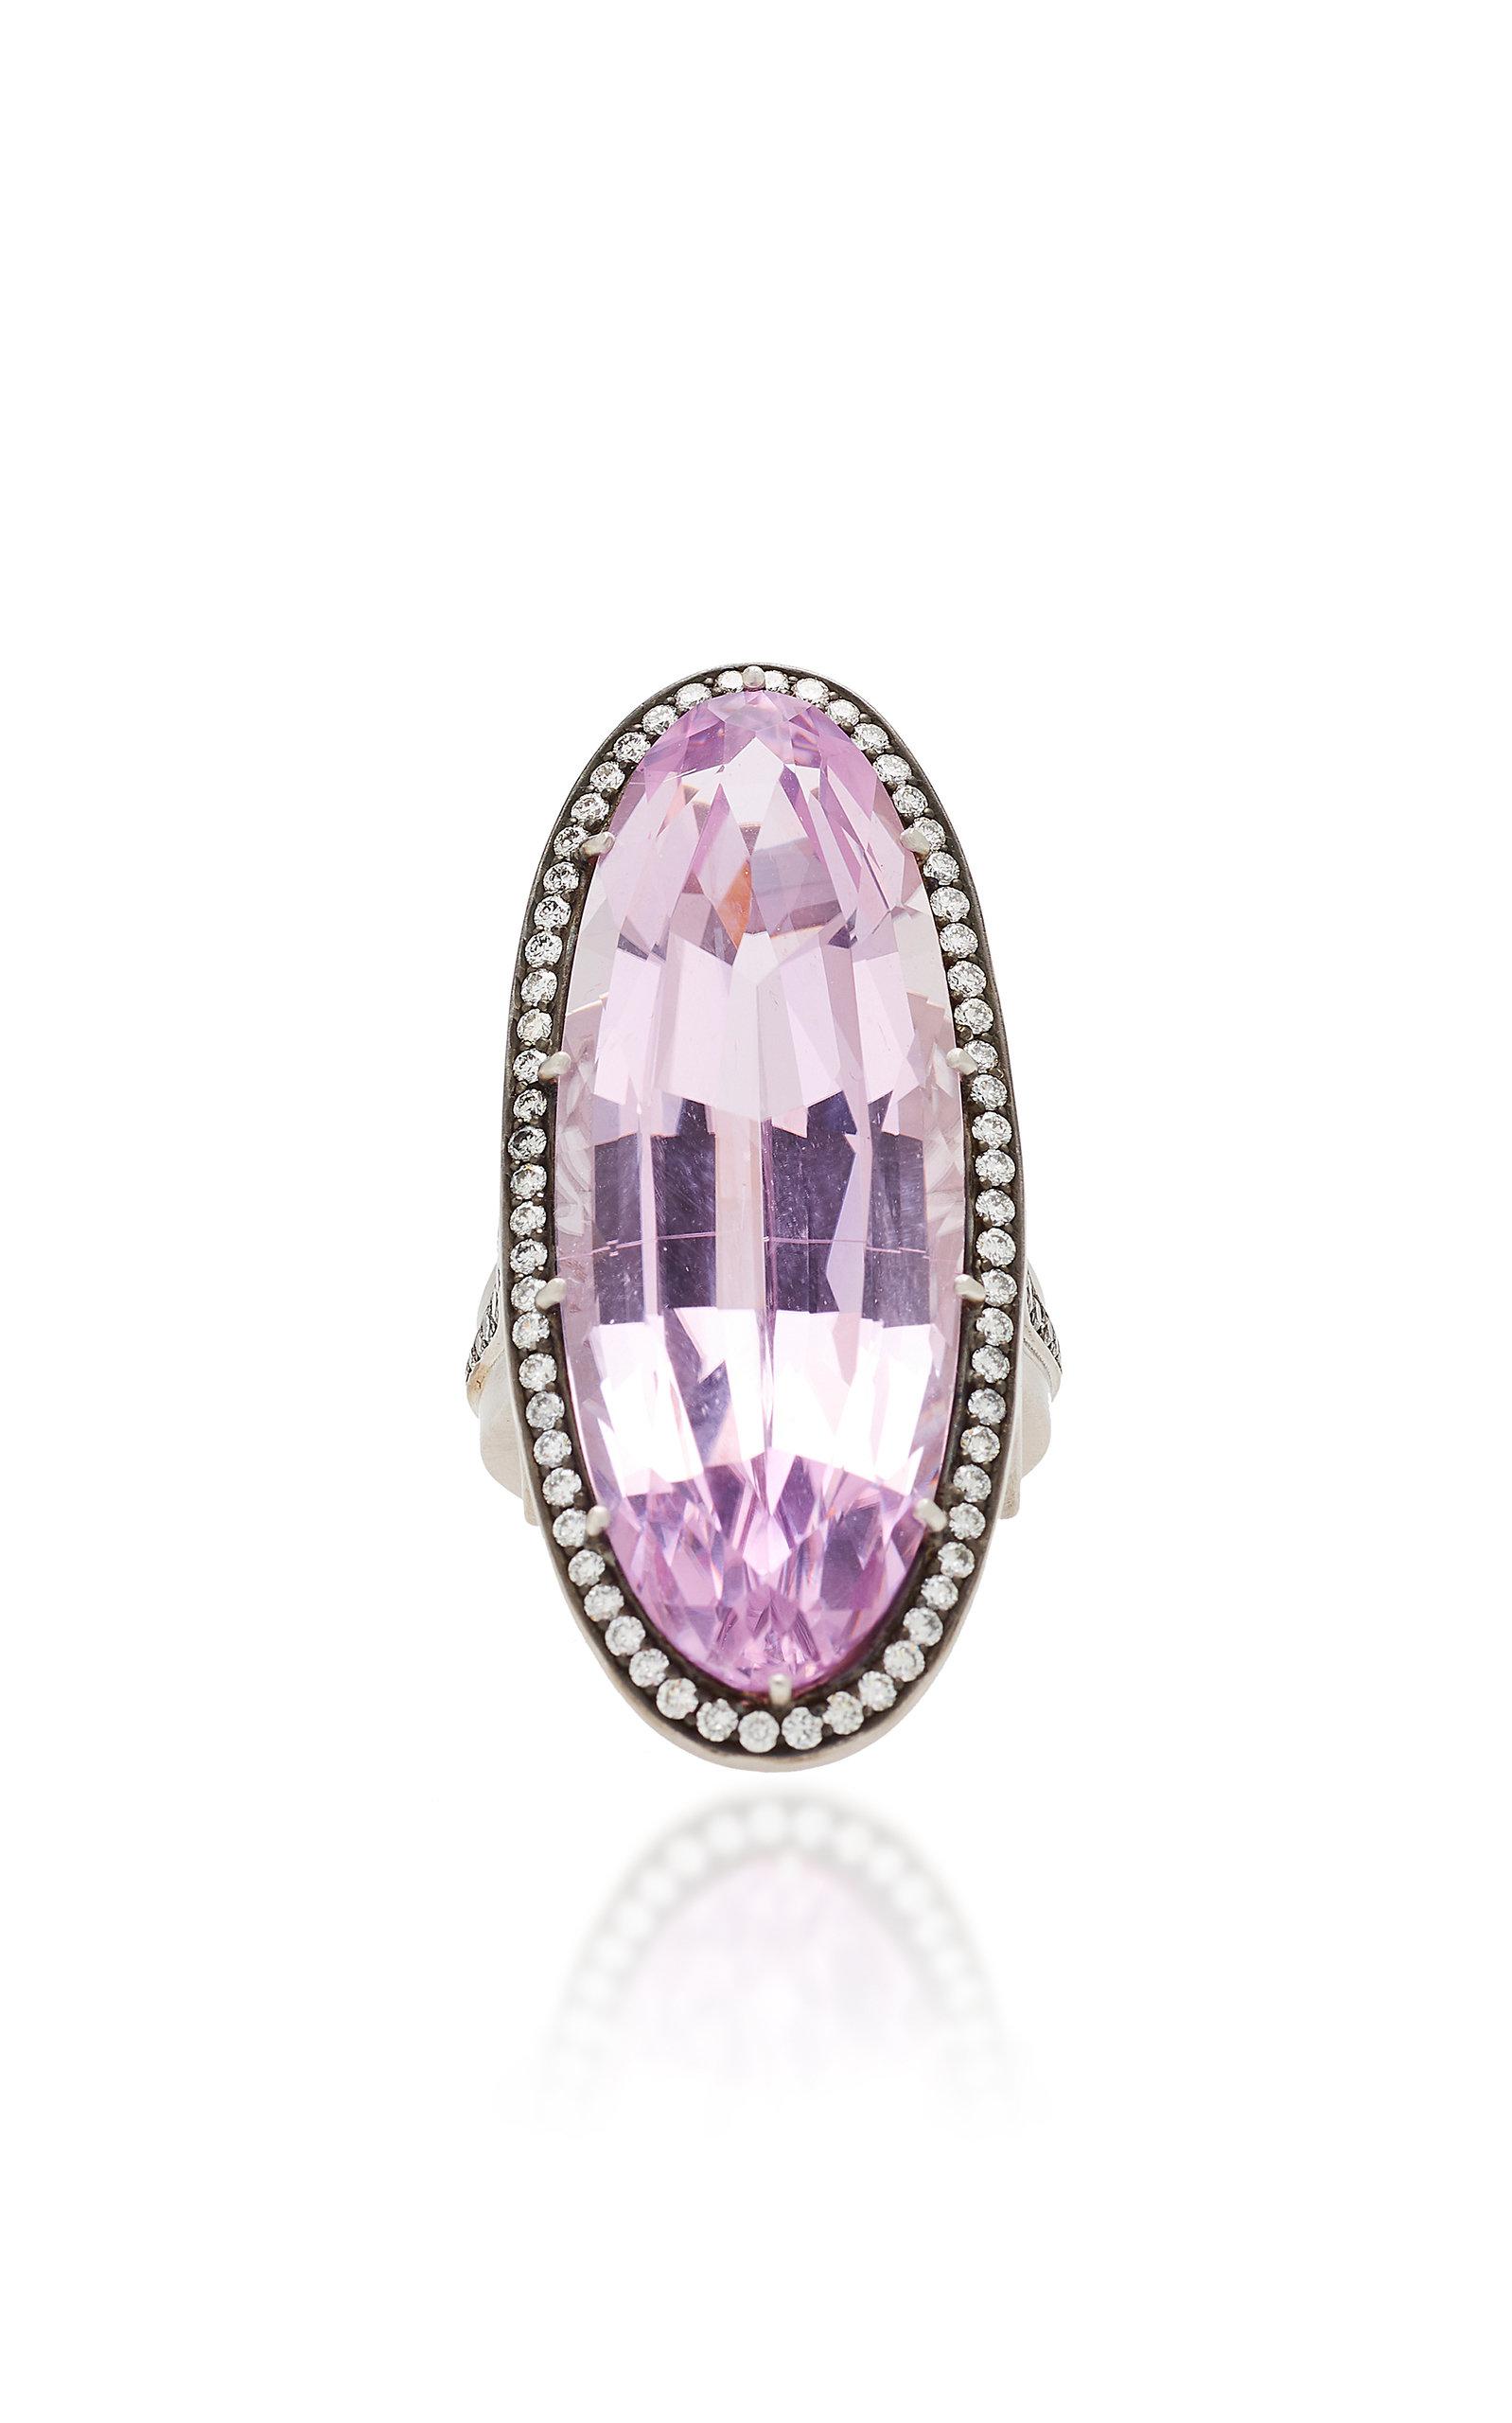 SYLVA & CIE 18K White Gold Kunzite And Diamond Ring in Purple